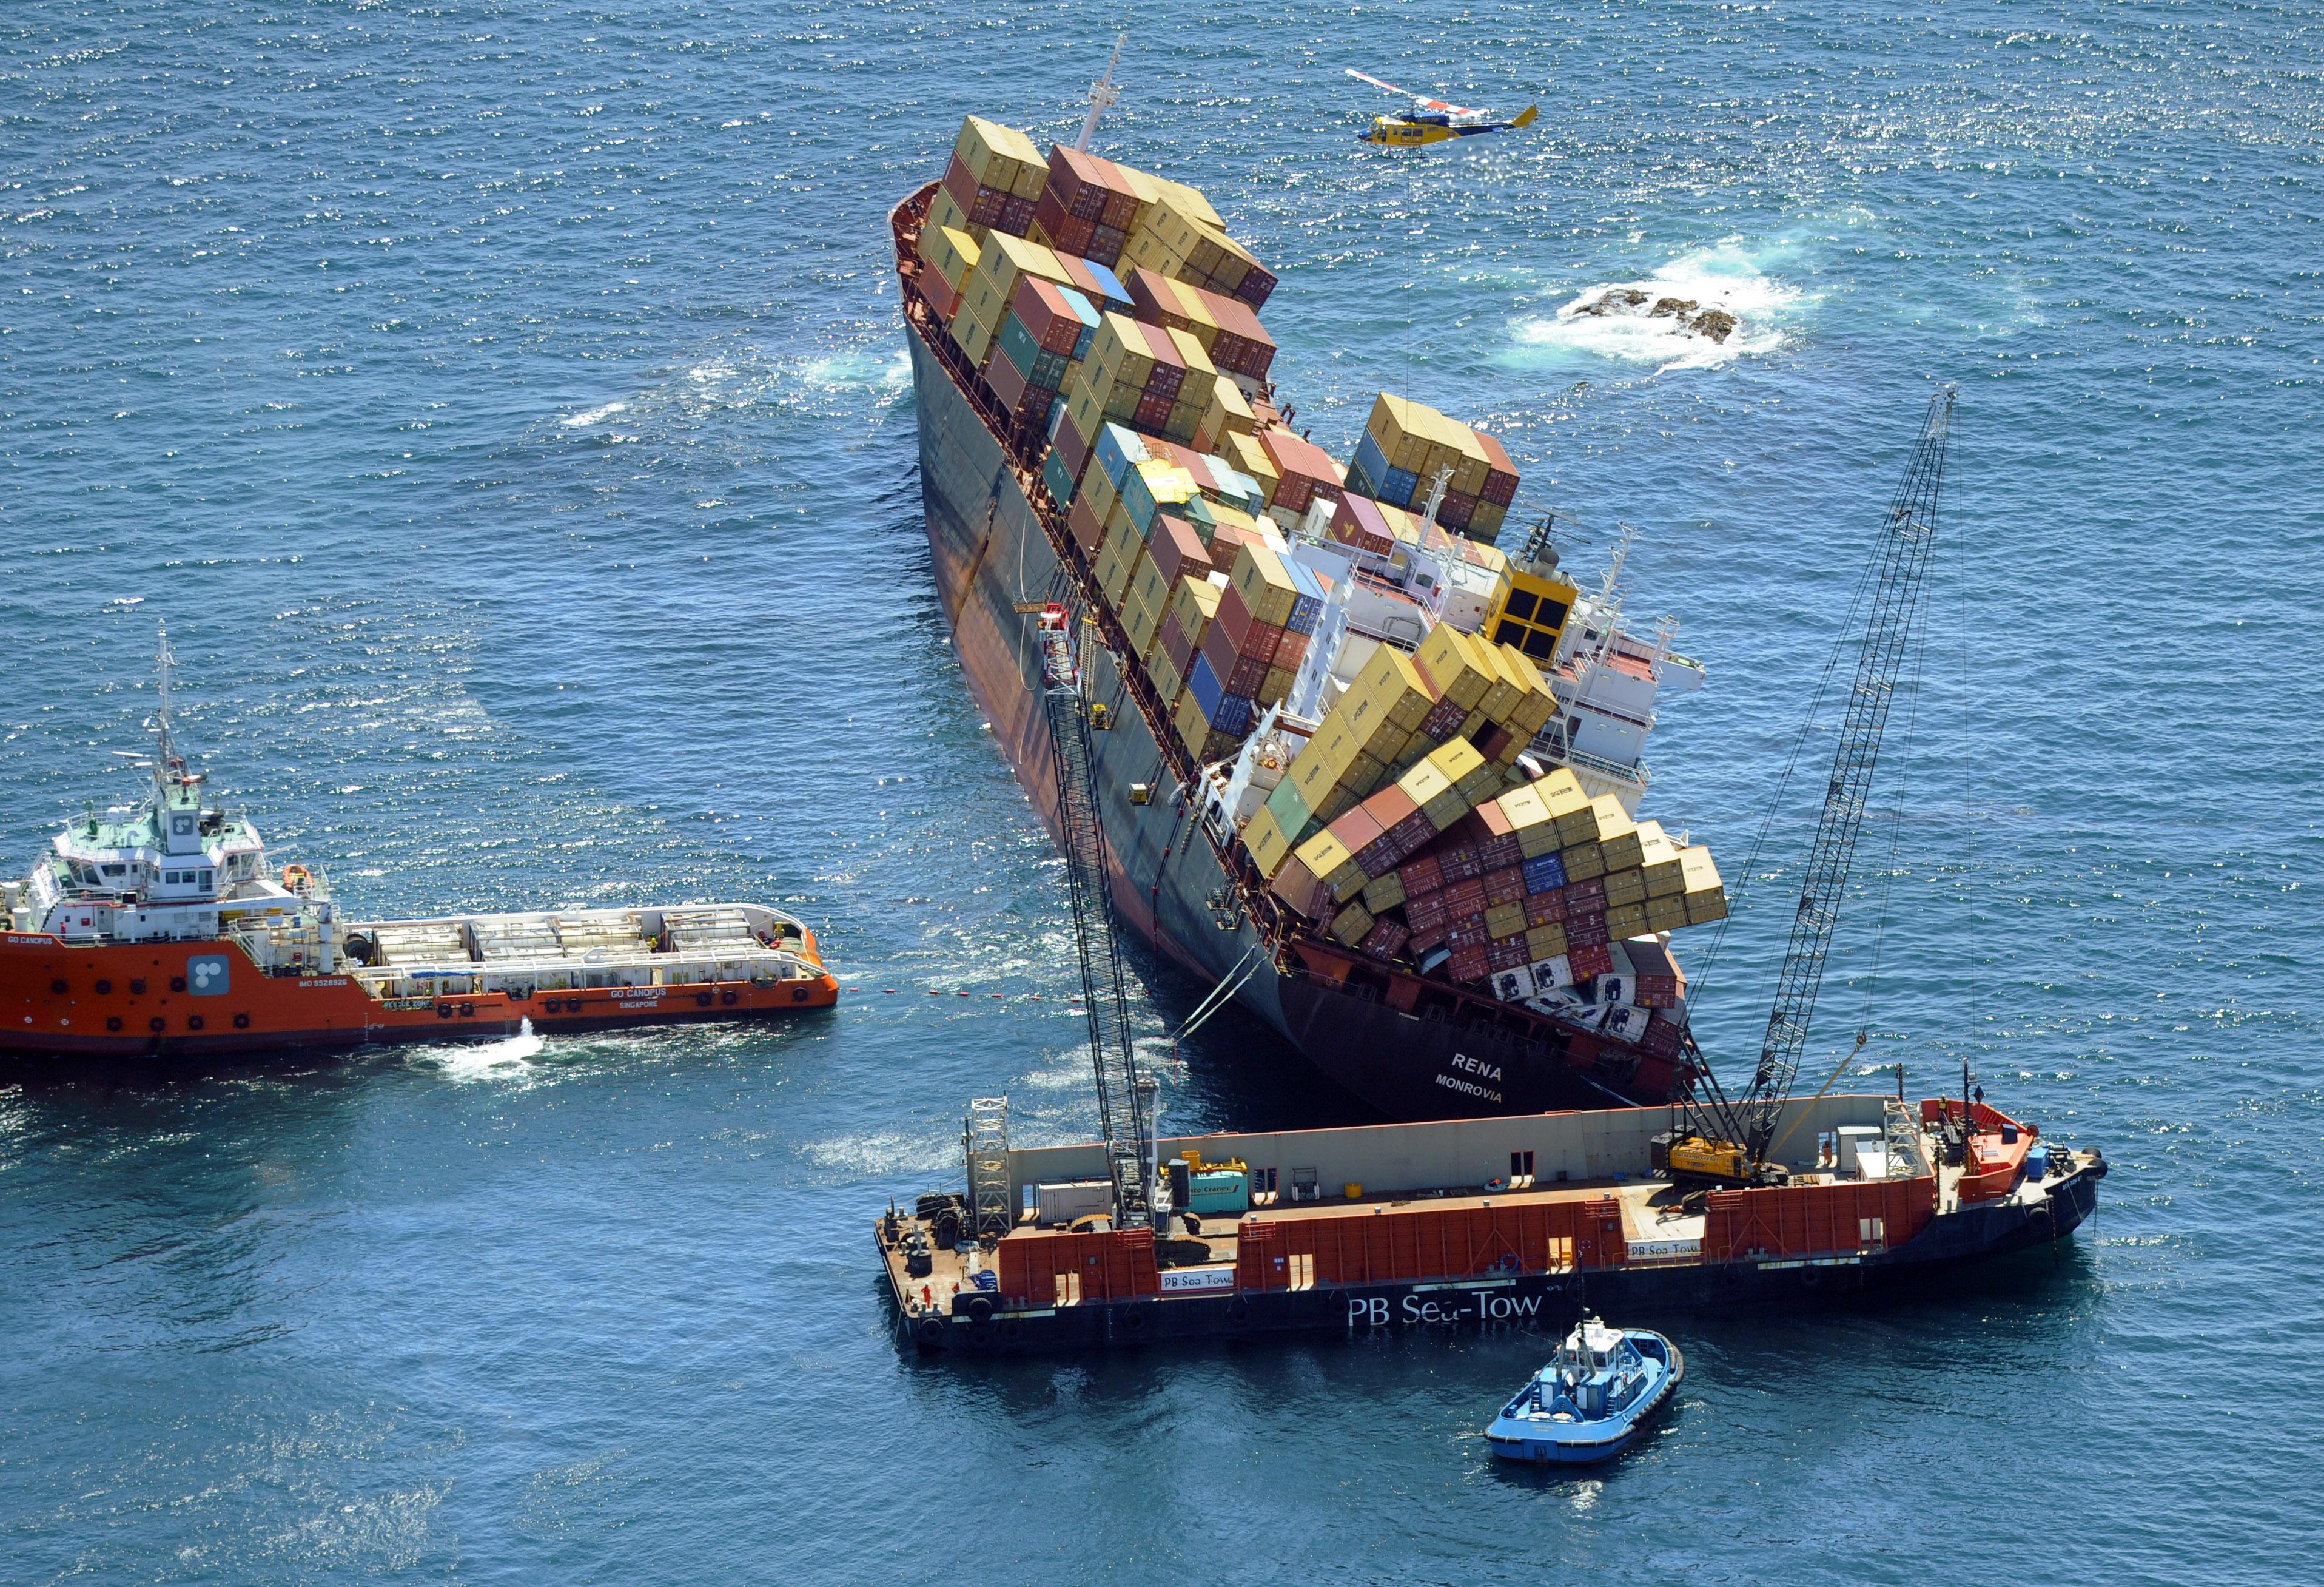 Cargo Ship Rena aground